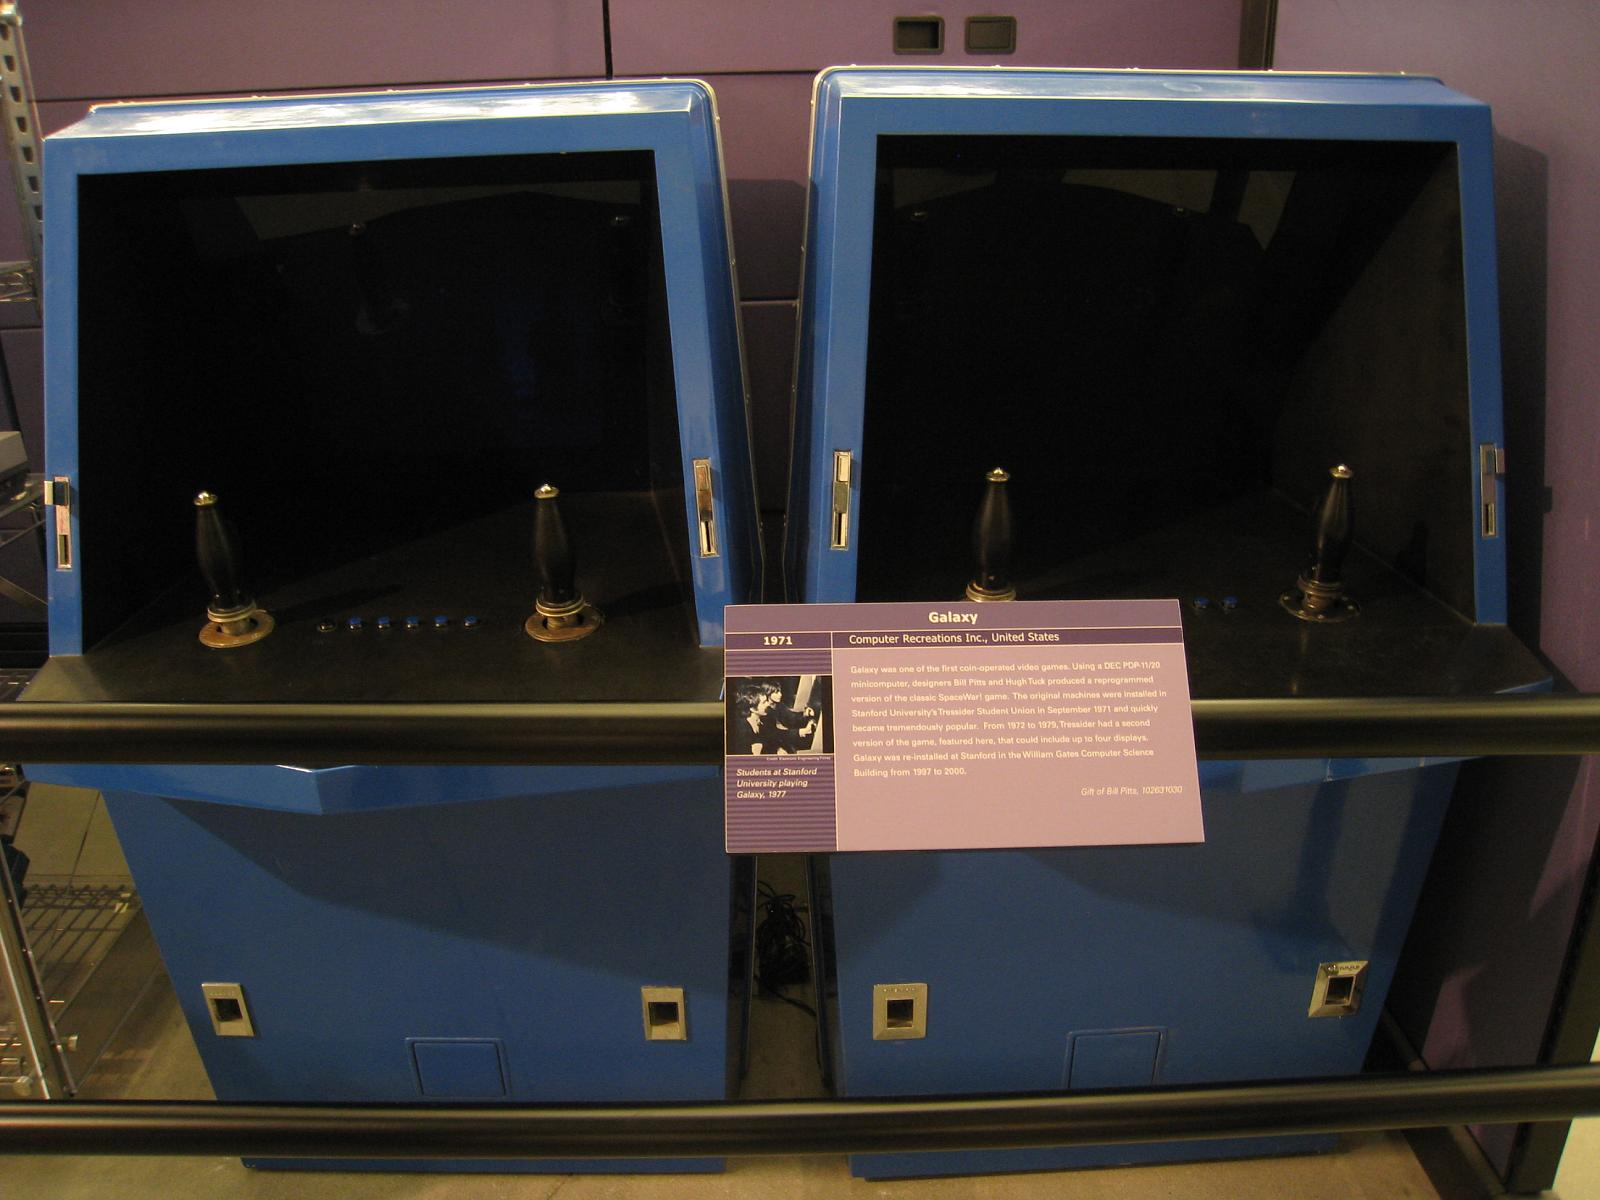 File:Galaxy Game 1971 first arcade game.jpg